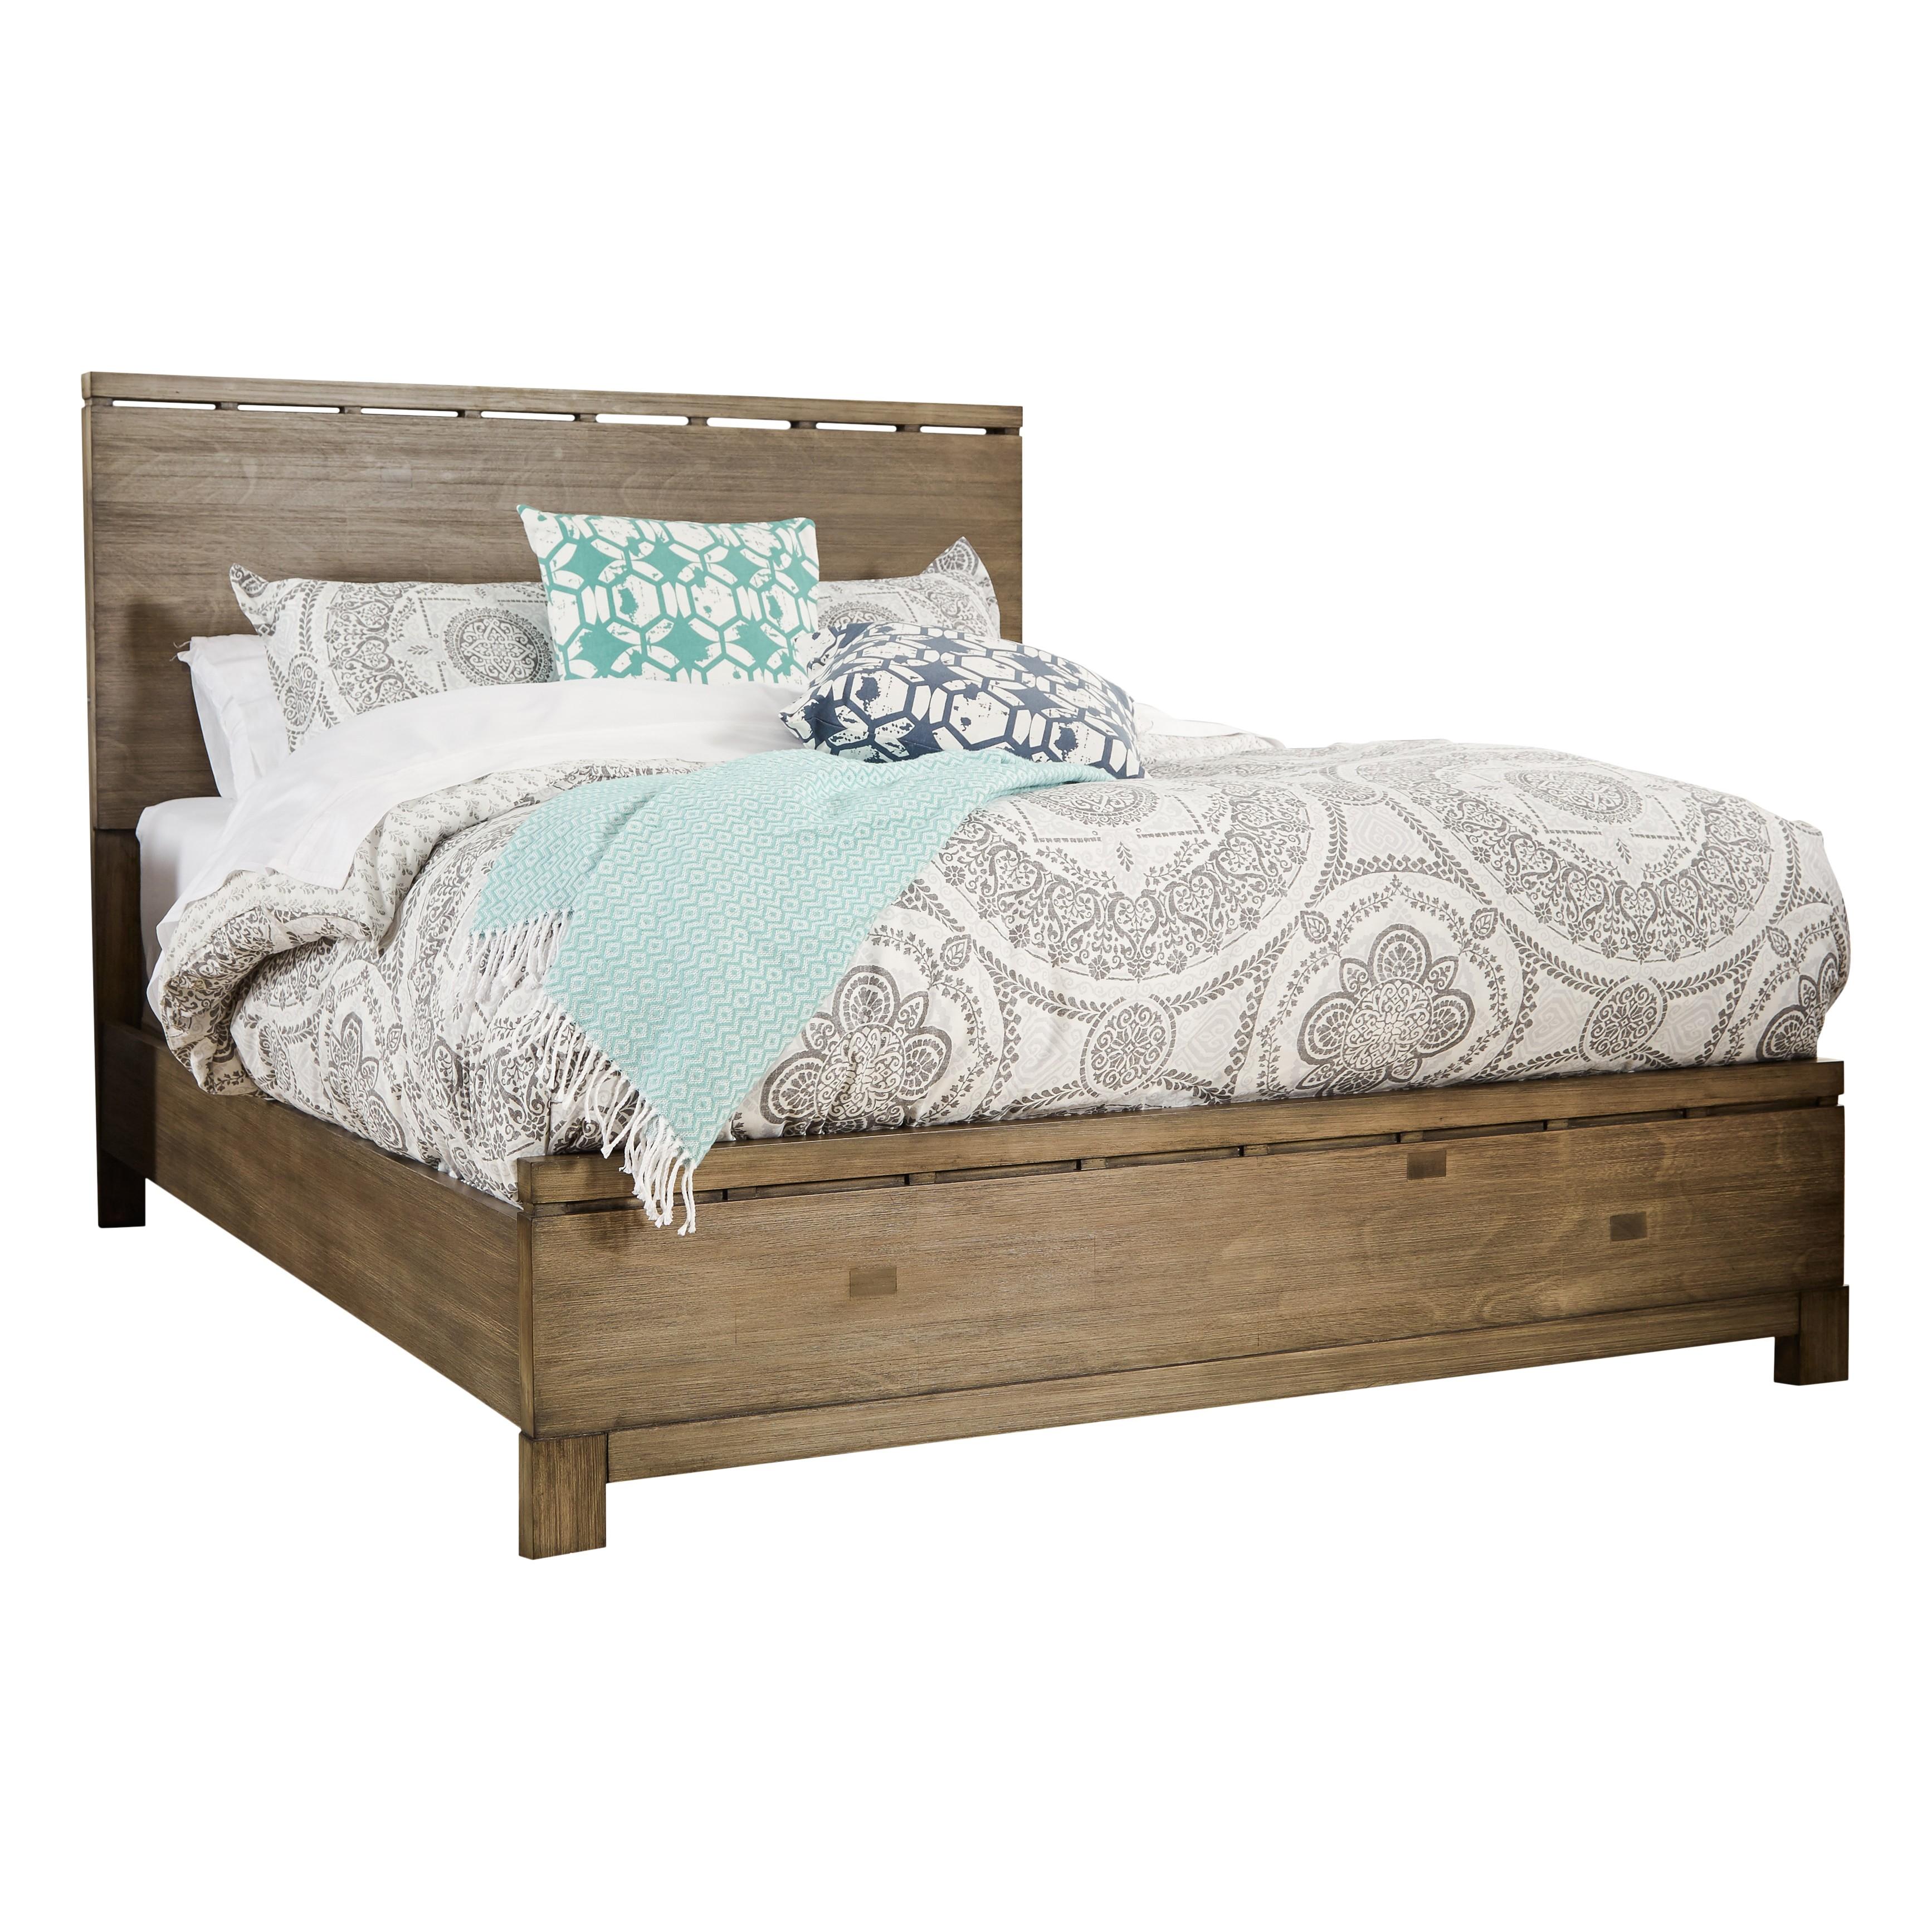 mercury row apollo reversible comforter set mcrr1790 mcrr1790